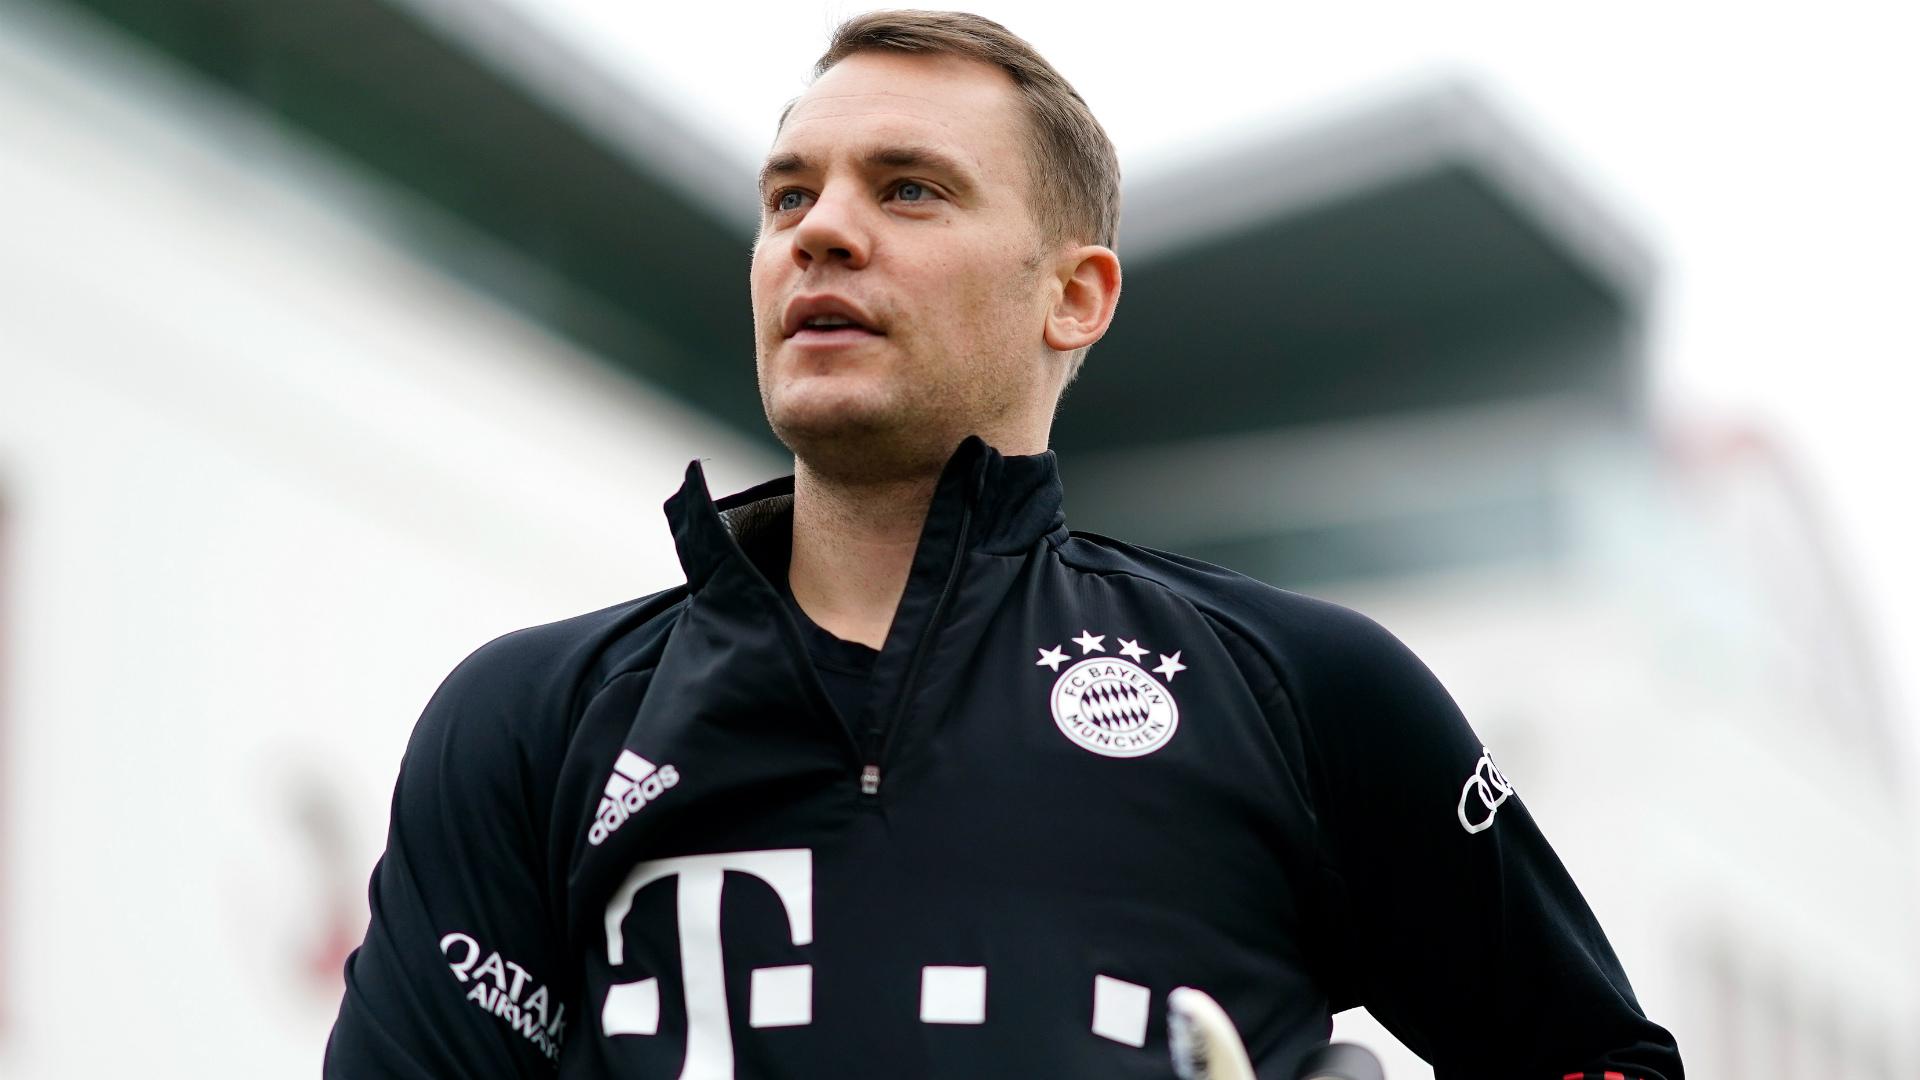 Bayern boss Flick hails 'insane professional' Neuer